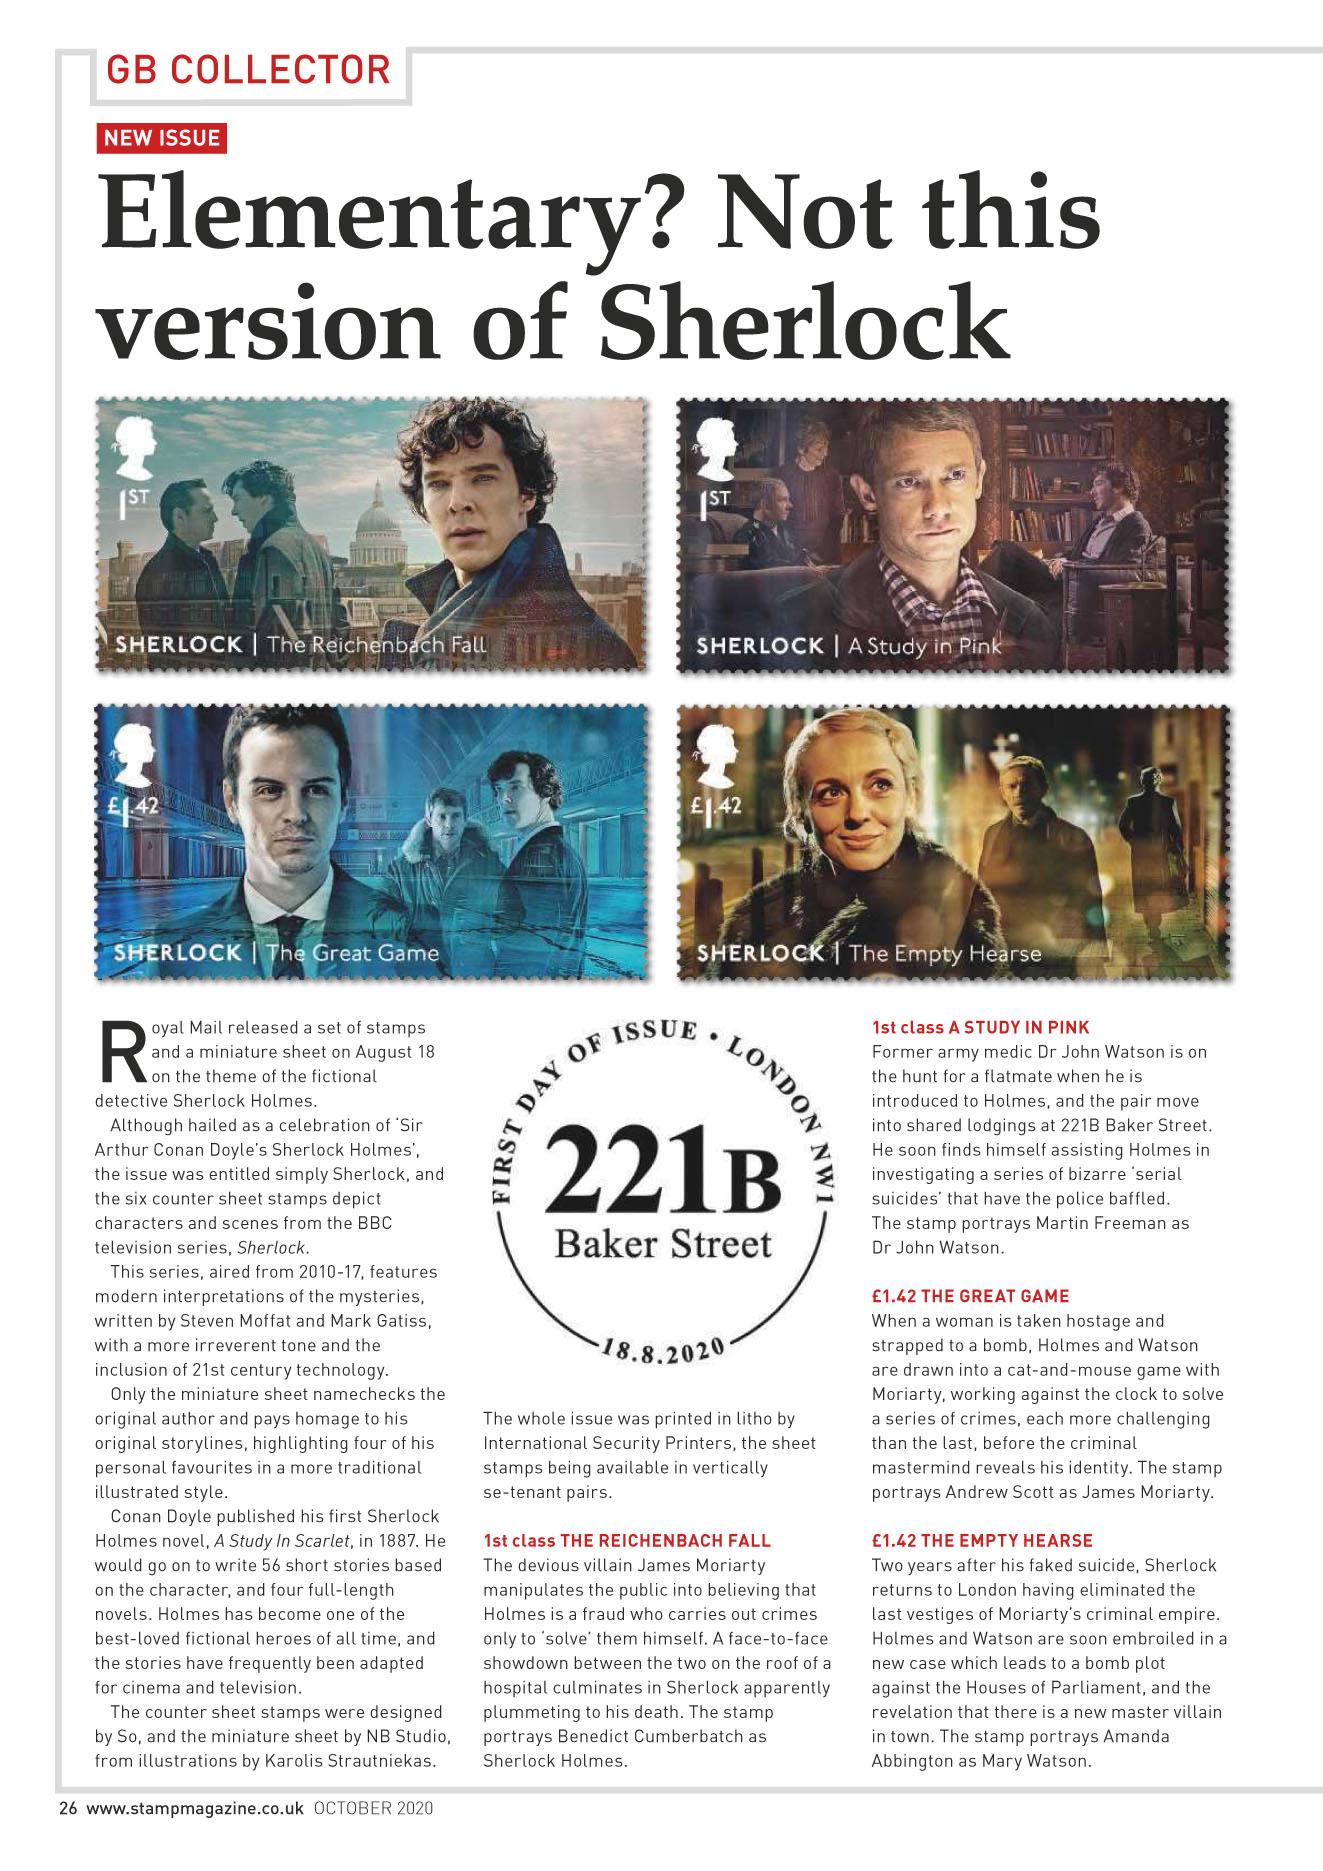 Stamp Magazine 2020-10 01.jpg